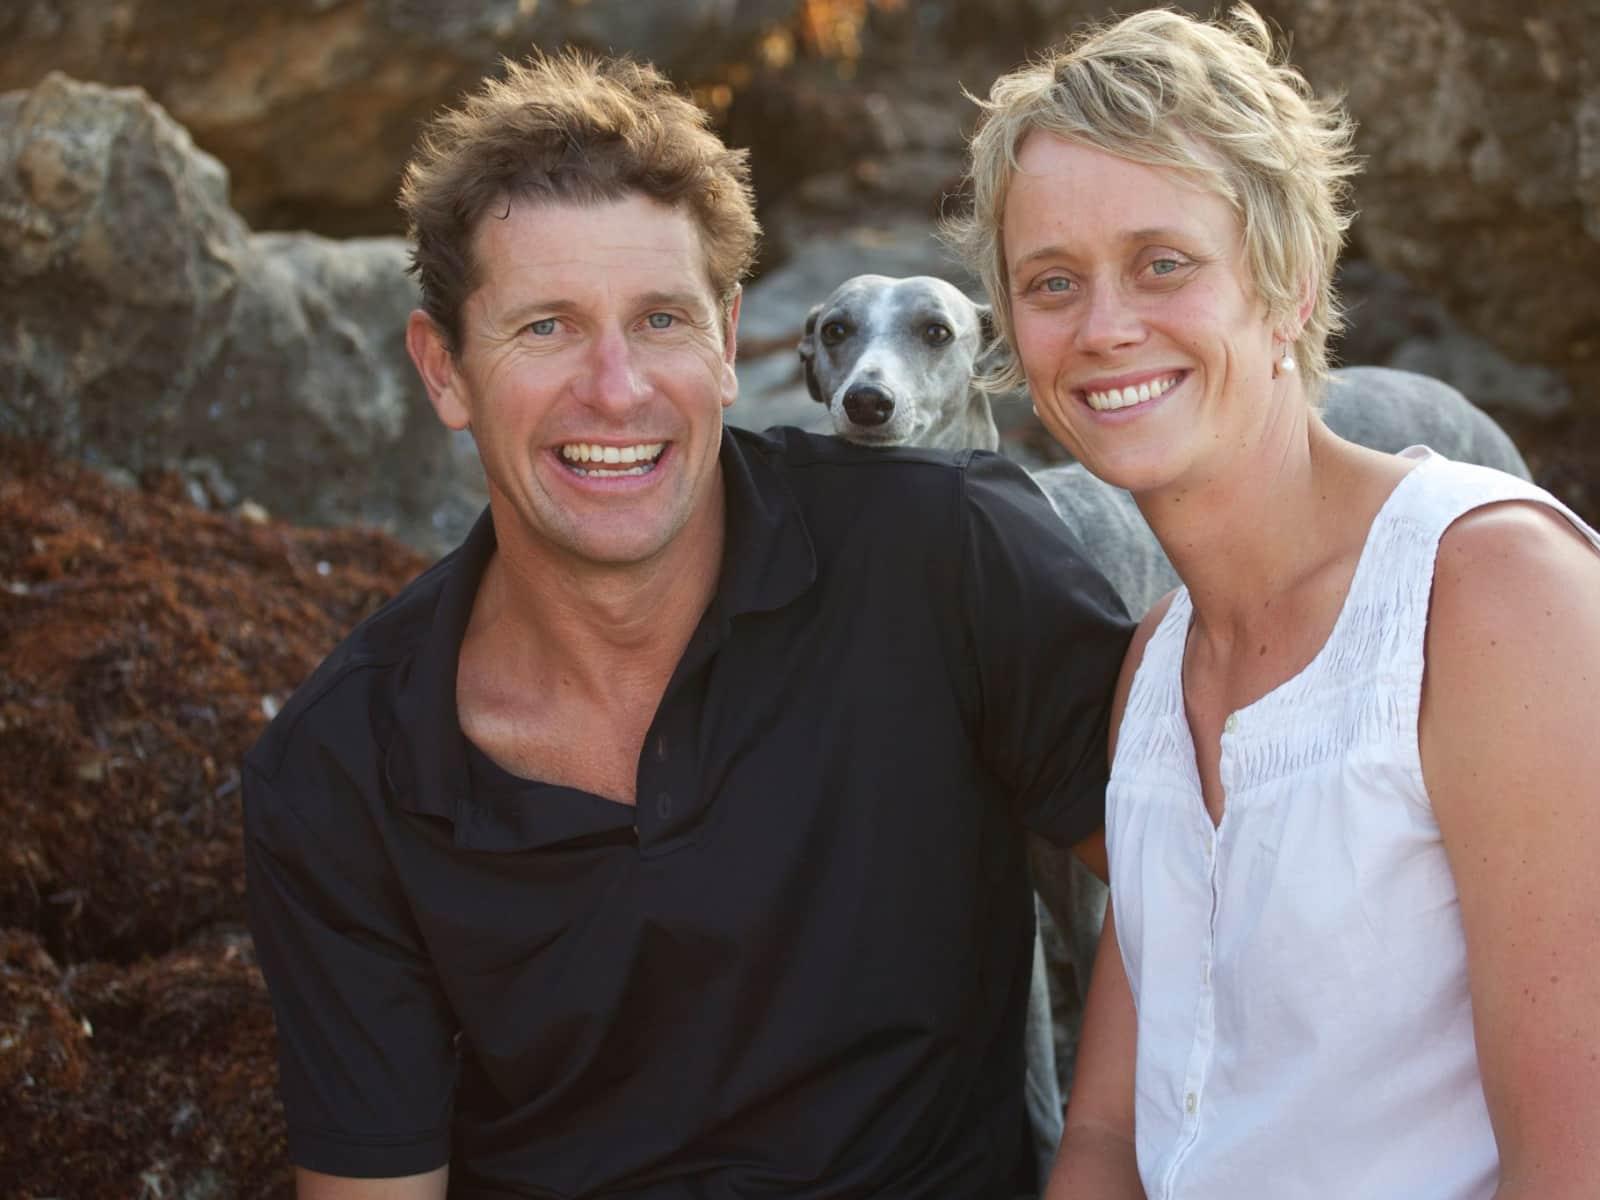 Rachel & Ric from Perth, Western Australia, Australia